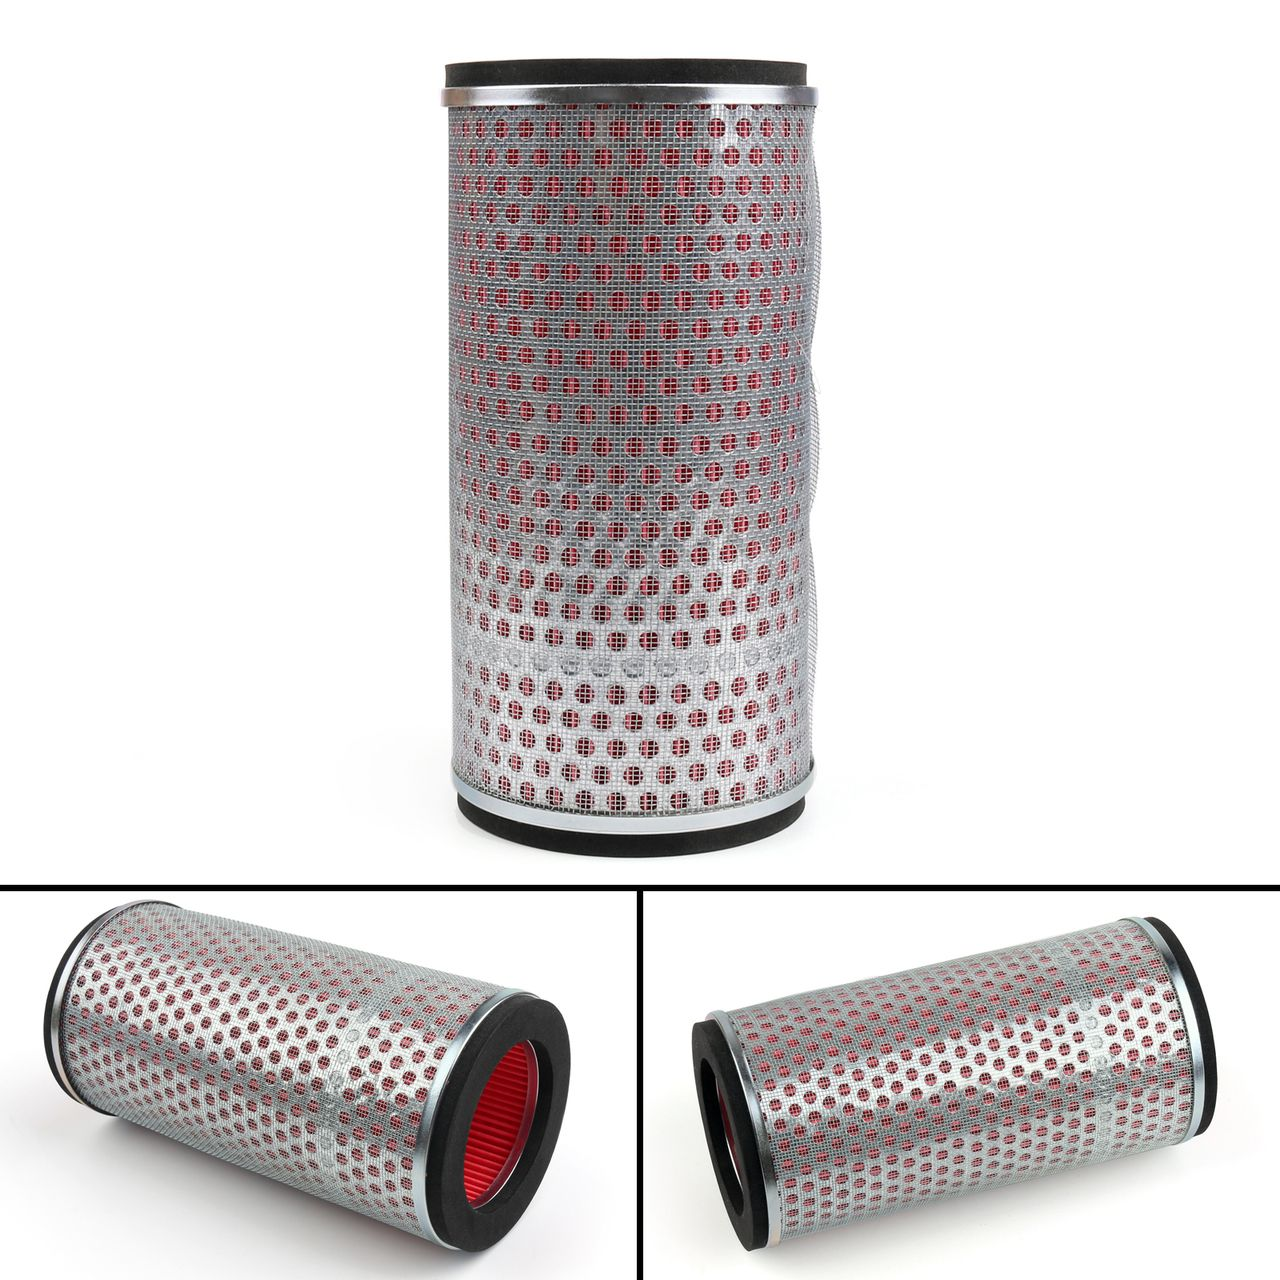 Air Filter Air Cleaner For Honda CB250 JADE250, CBR250